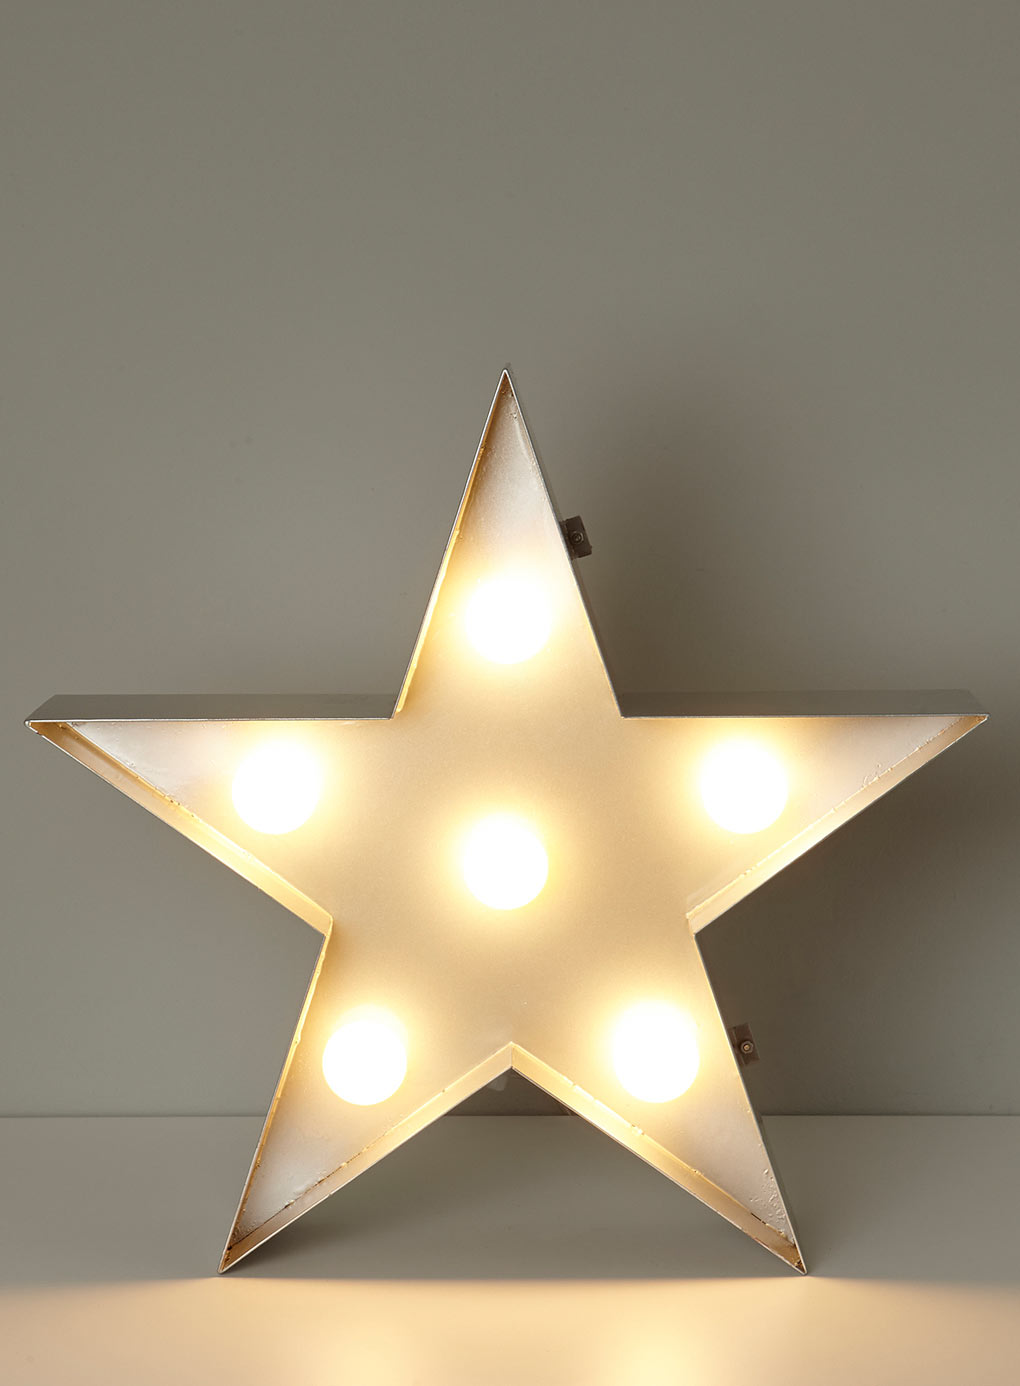 Star light tidylife bhs star light aloadofball Gallery